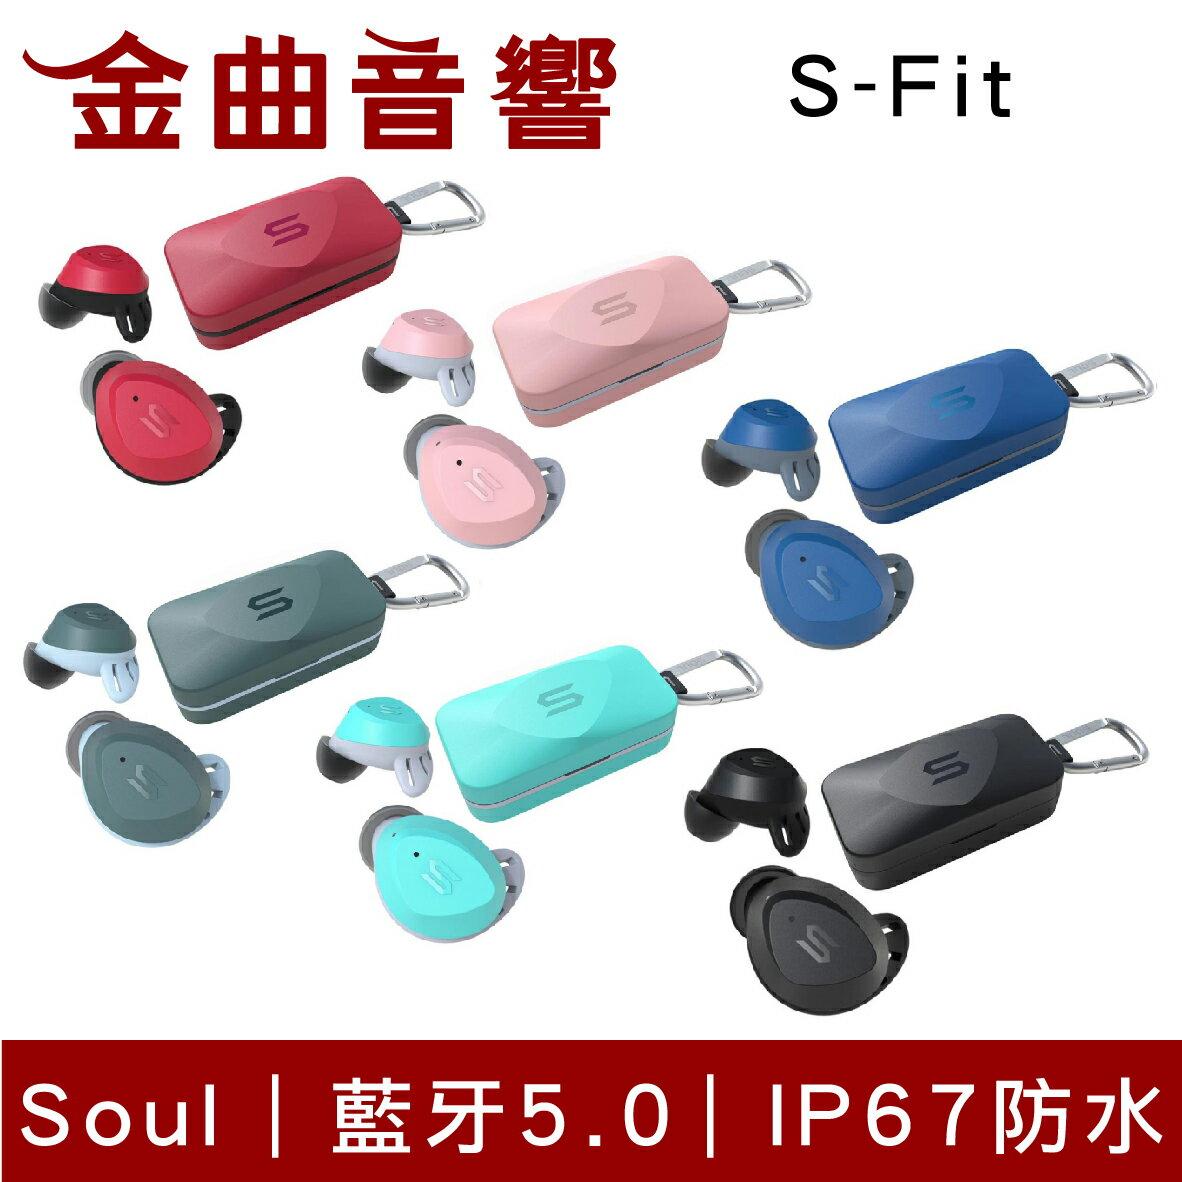 Soul S-Fit 藍 IP67 軍用級 防水 防塵 環境音效 藍芽 耳機   金曲音響